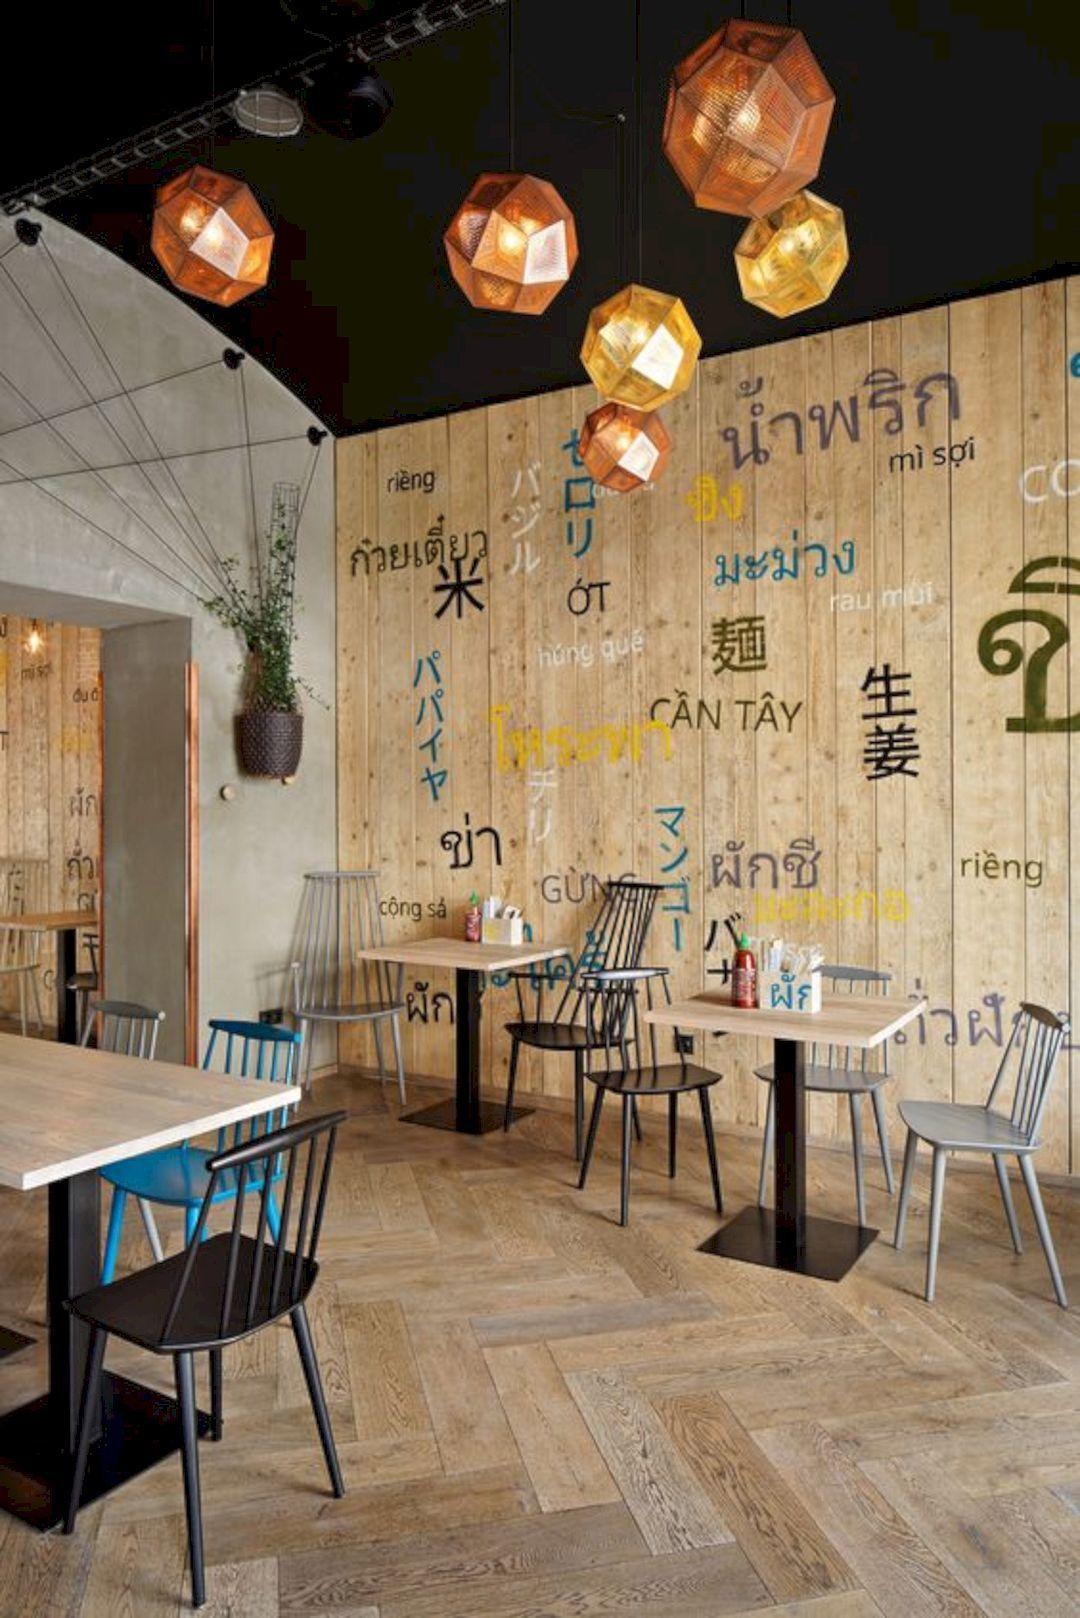 15 Stylish Interior Design Ideas for Thai Restaurant | Thai ...